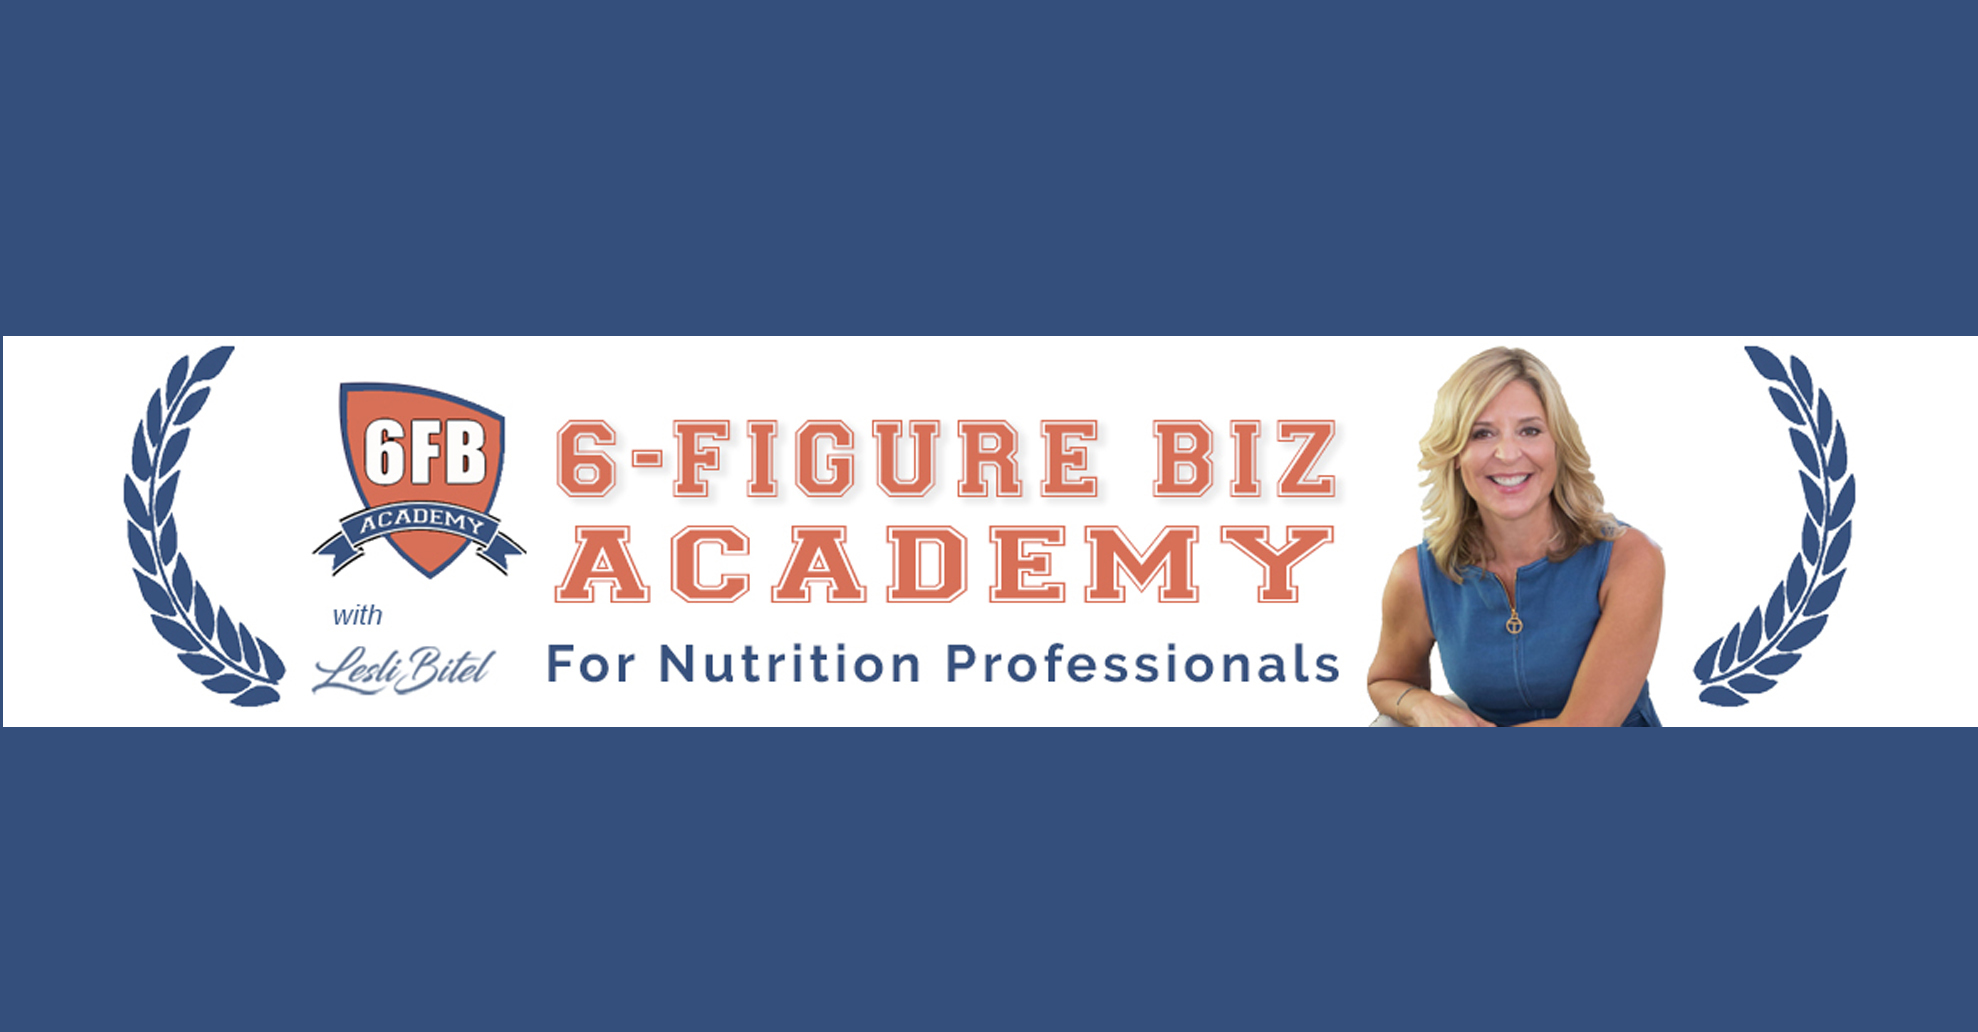 lesli bitel 6 figure biz academy health practice coaching